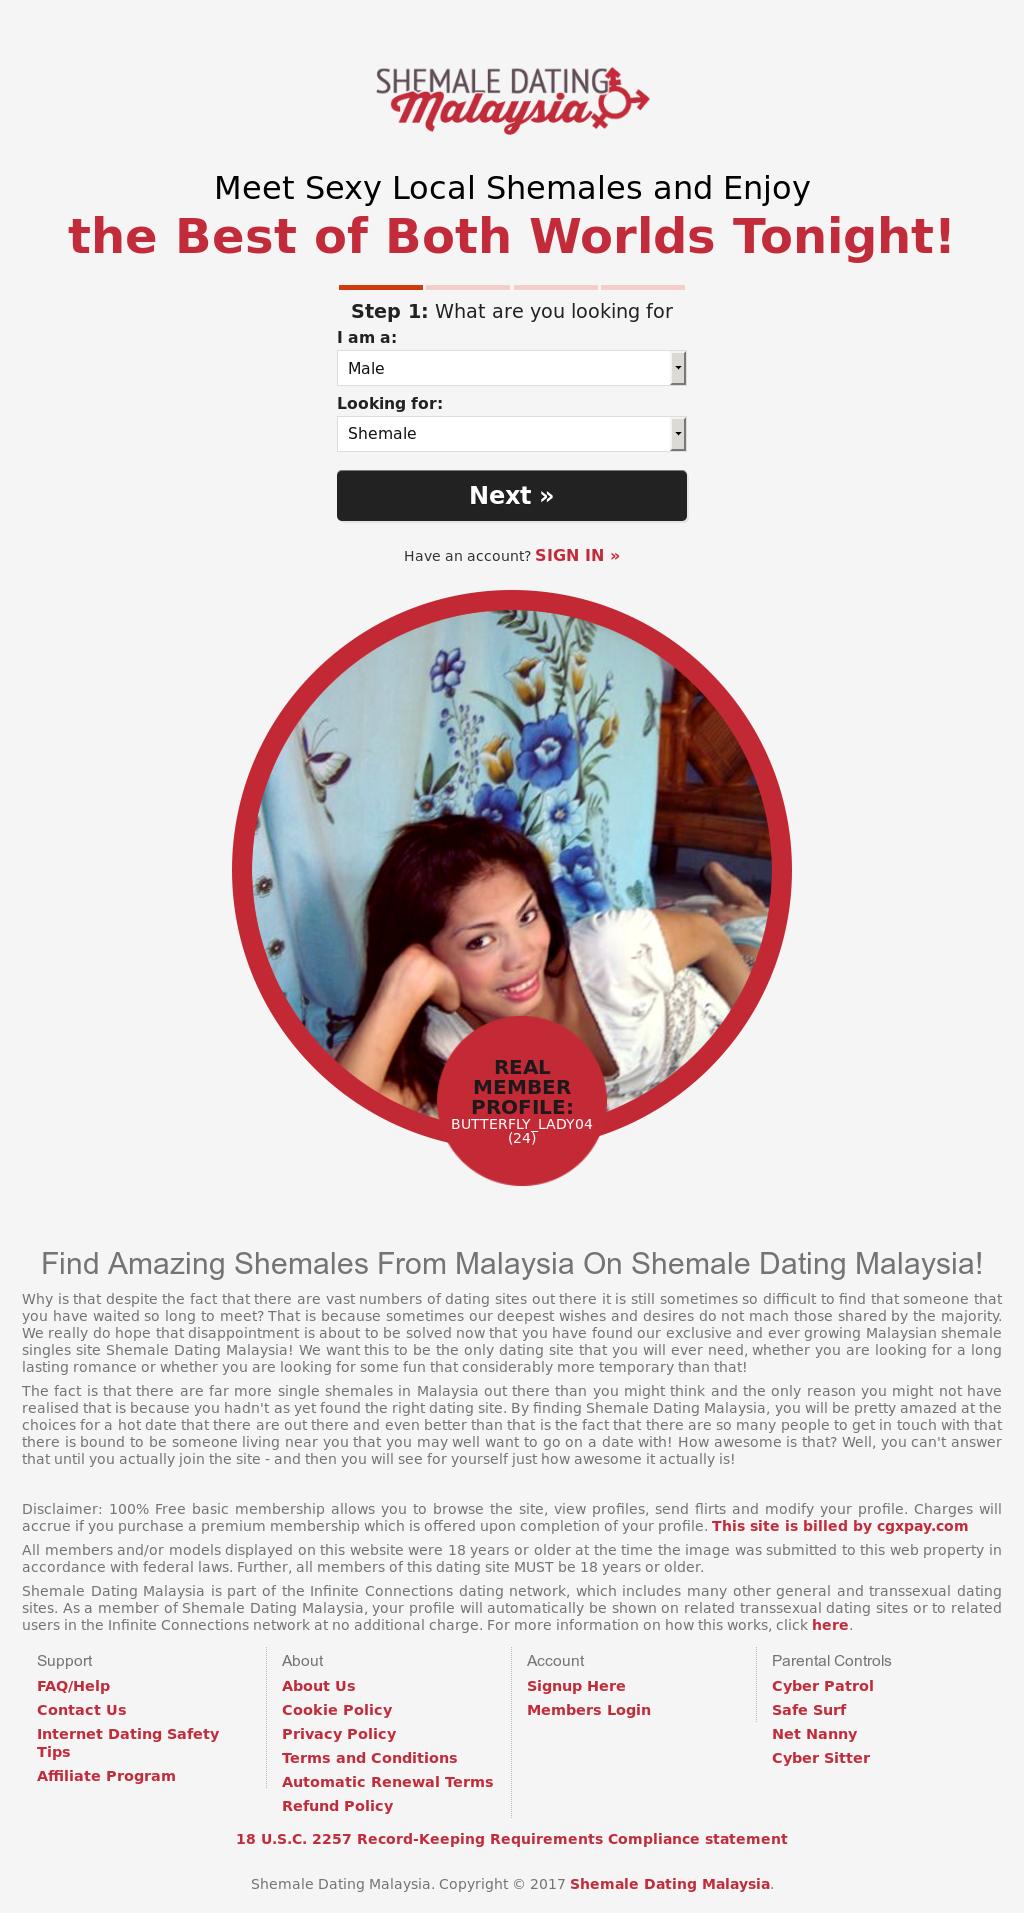 Shemale dating malaysia